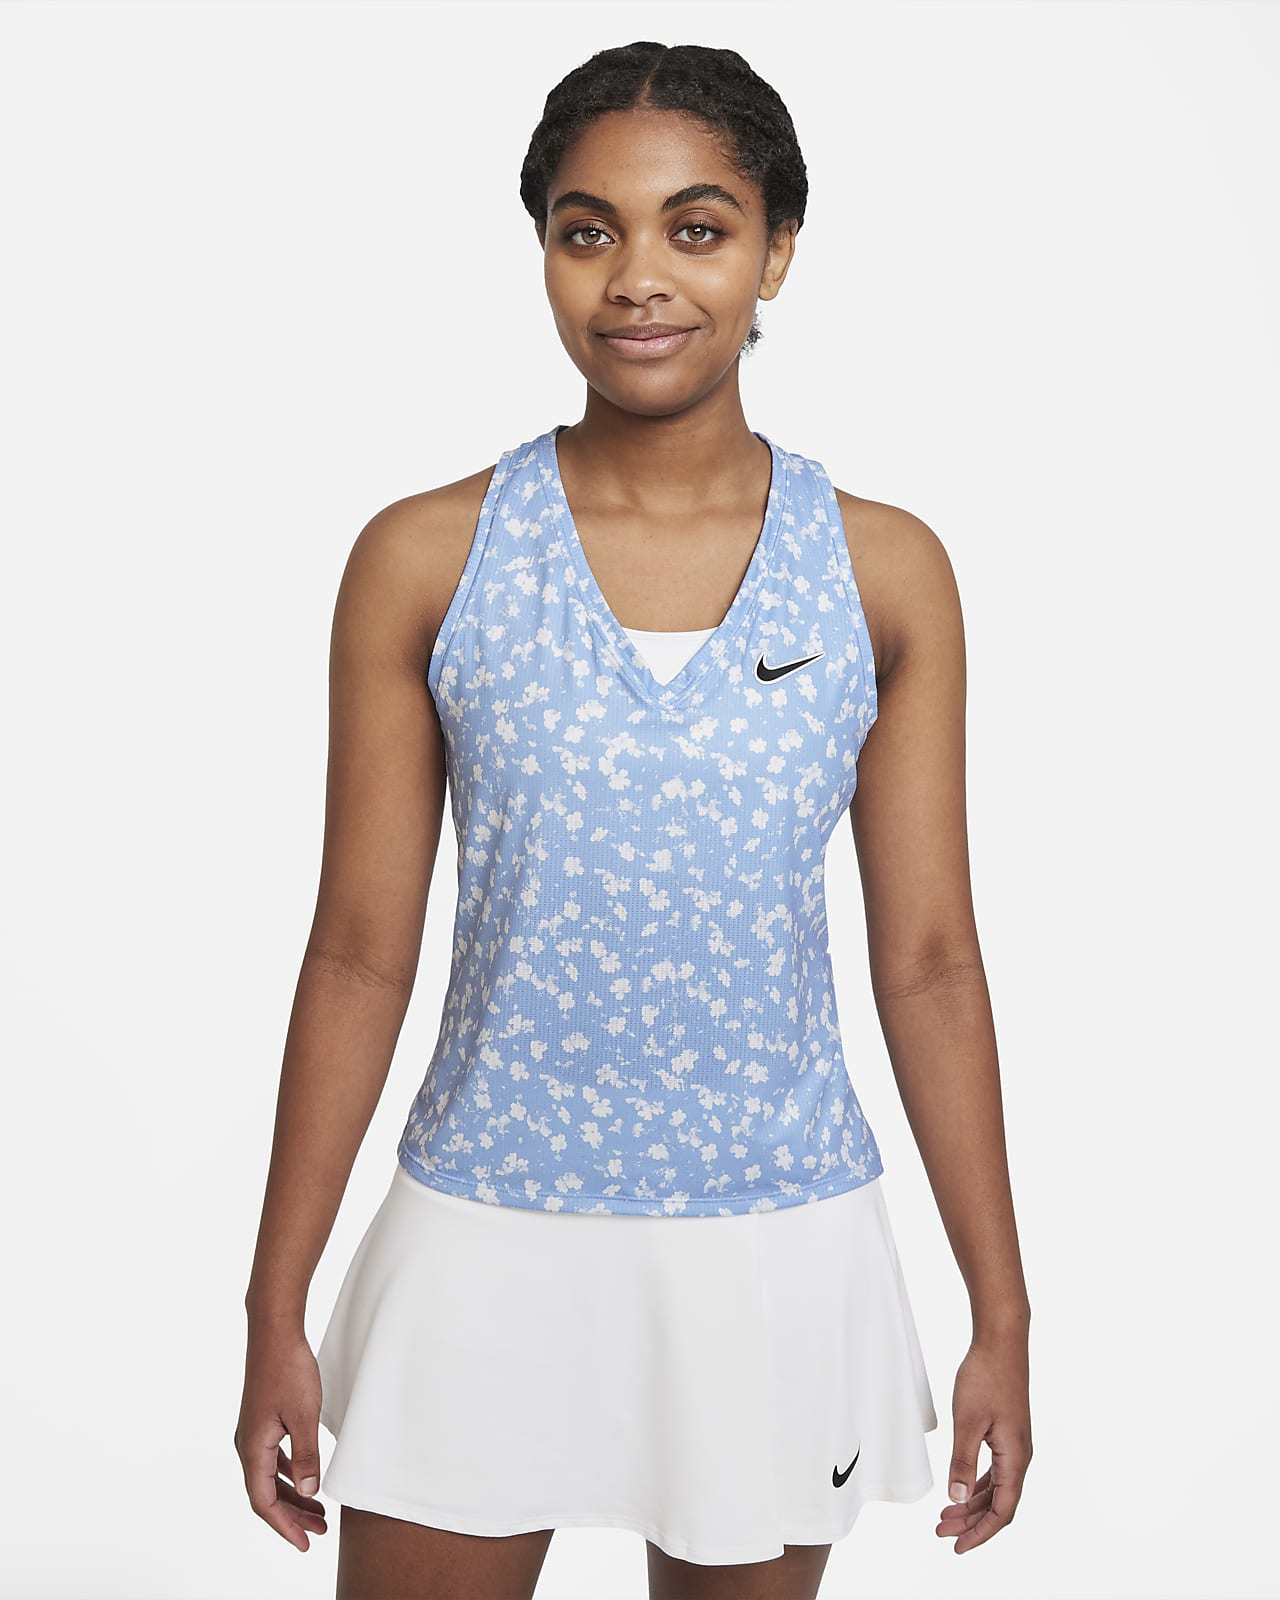 Camiseta de tirantes de tenis estampada para mujer NikeCourt Dri-FIT Victory